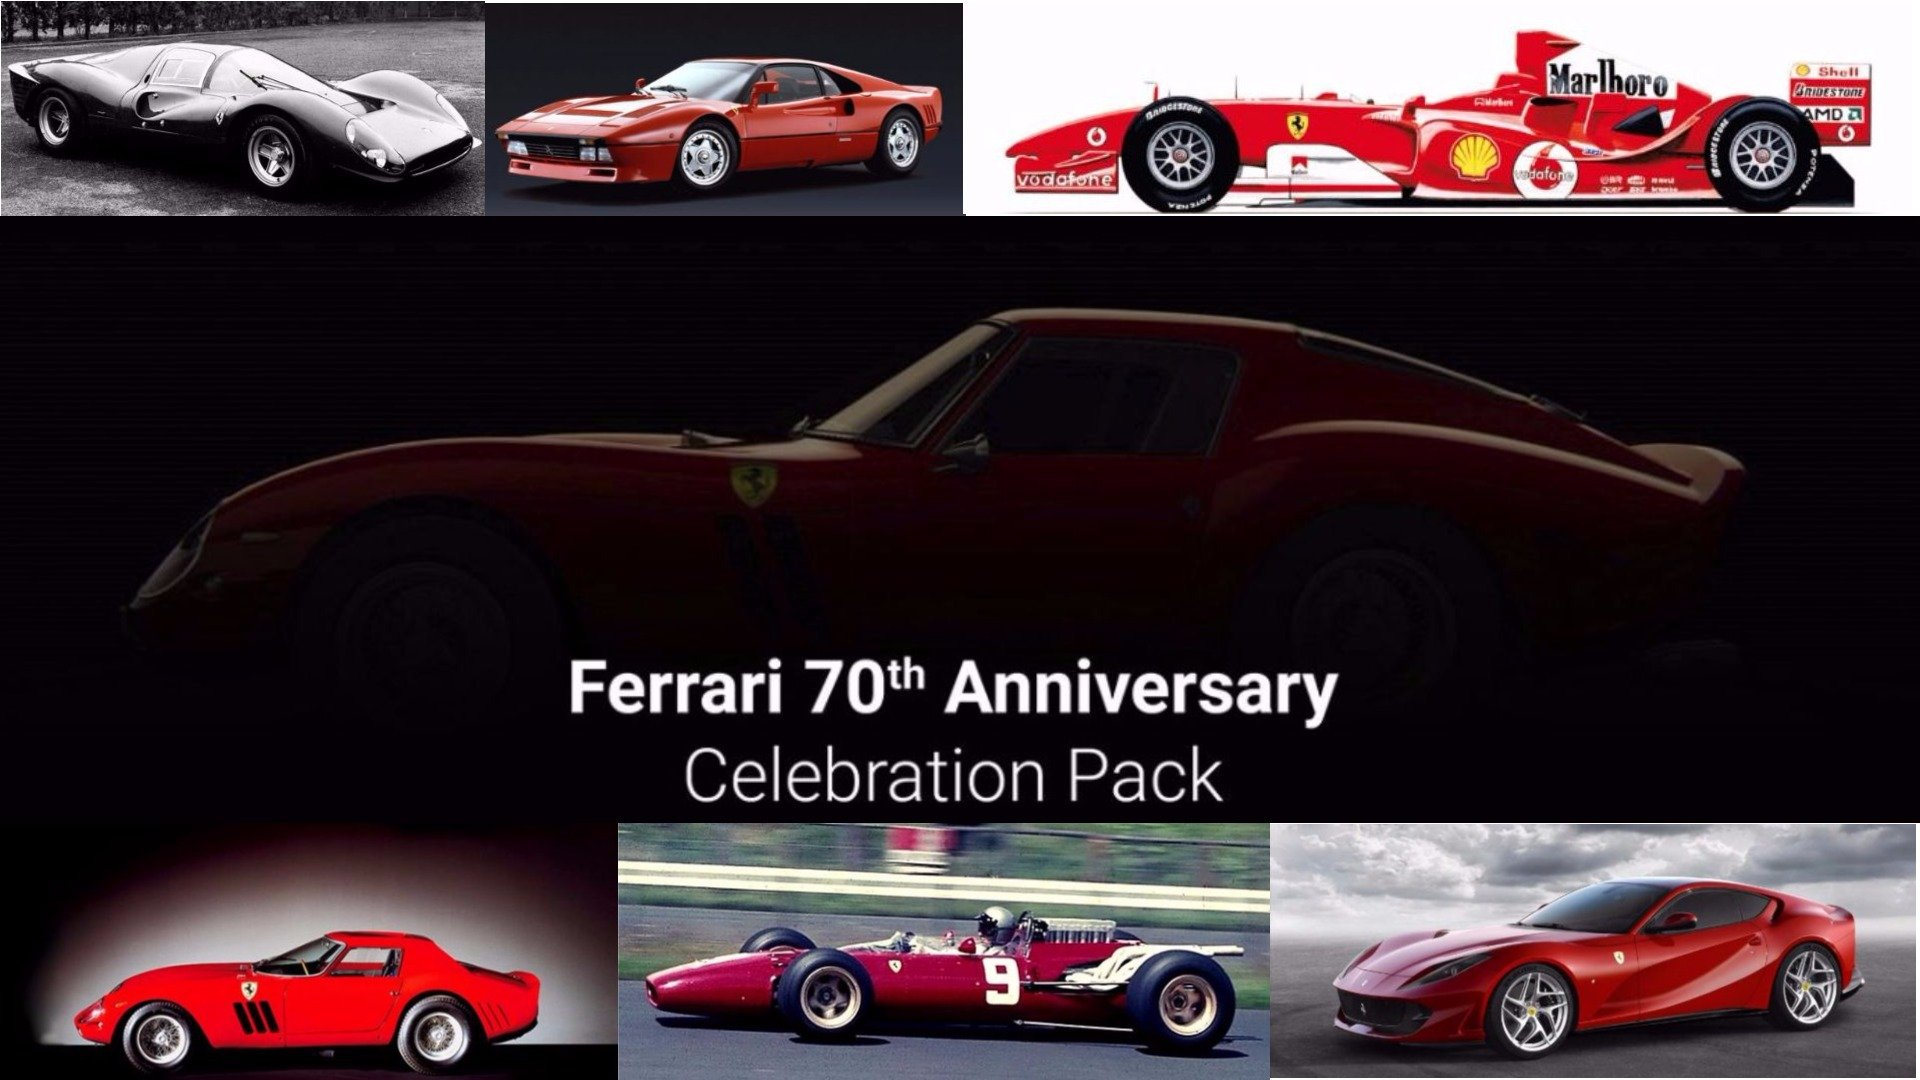 Assetto Corsa – Details on Ferrari 70th Anniversary